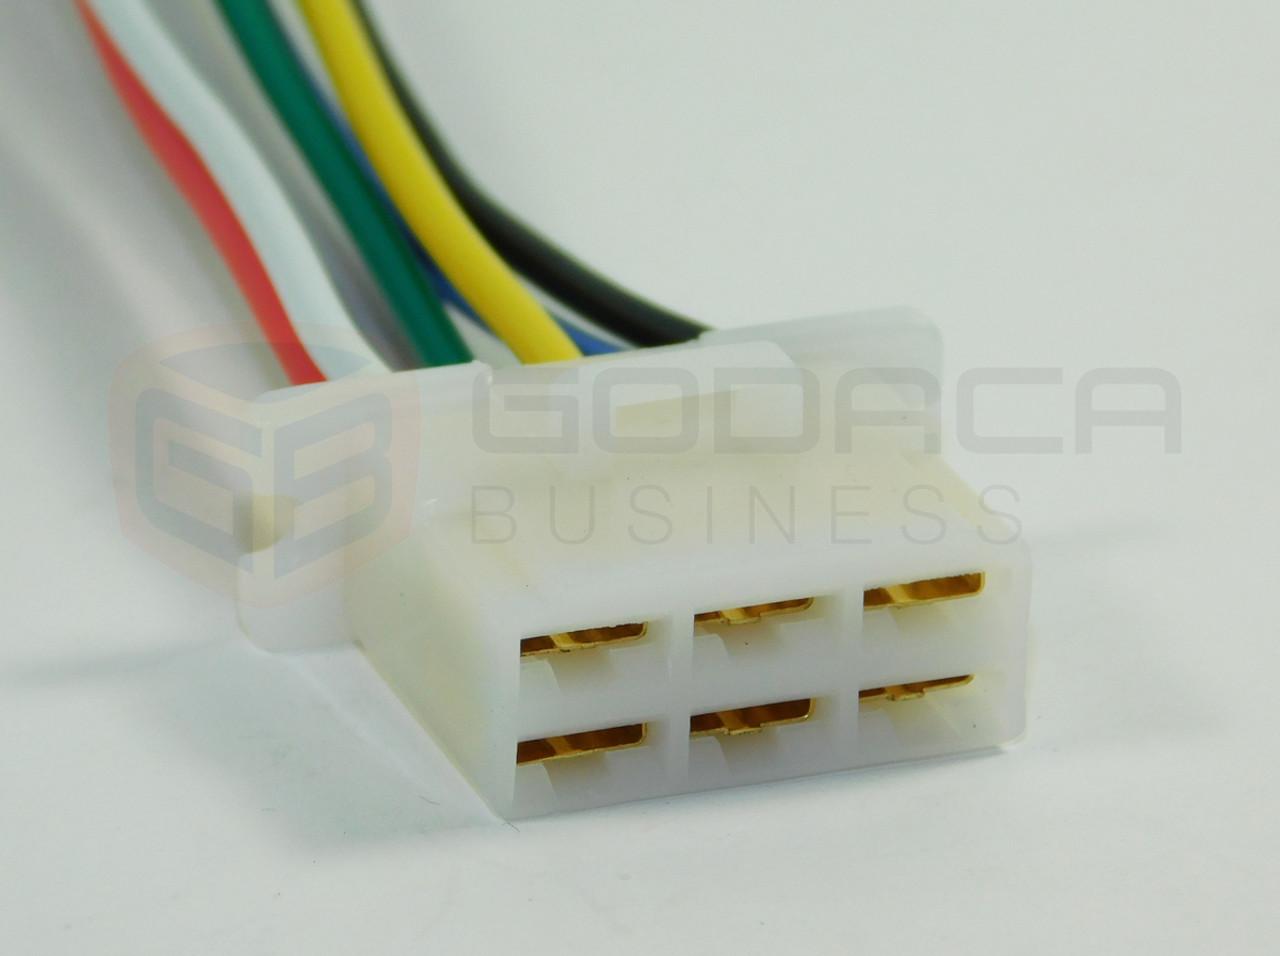 medium resolution of 1x connector alternator plug repair harness 6 way 6pin socket female terminal gm